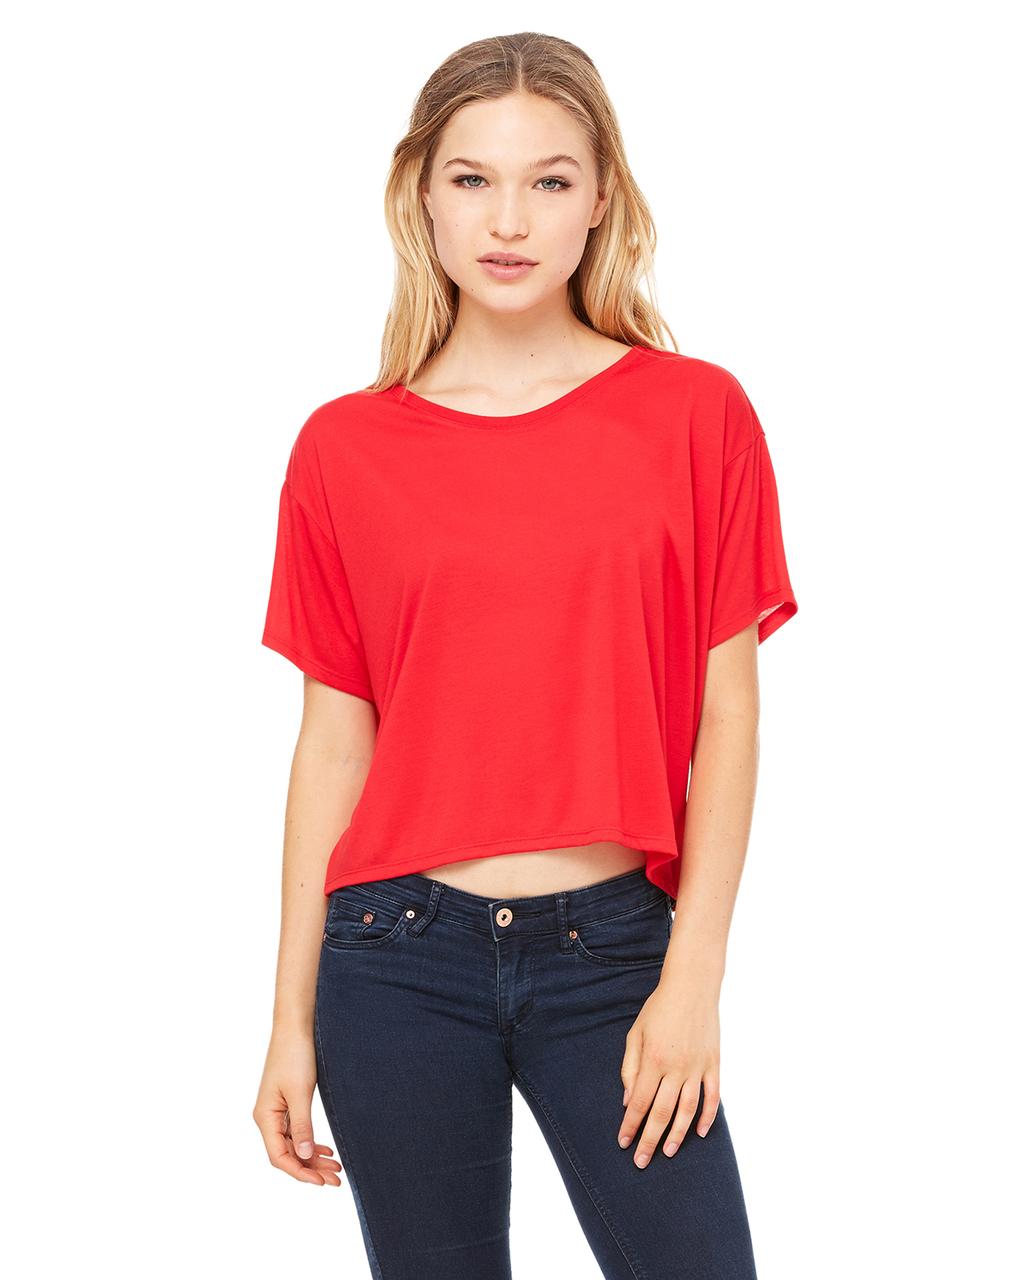 Bella Ladies' Flowy Boxy T-Shirt